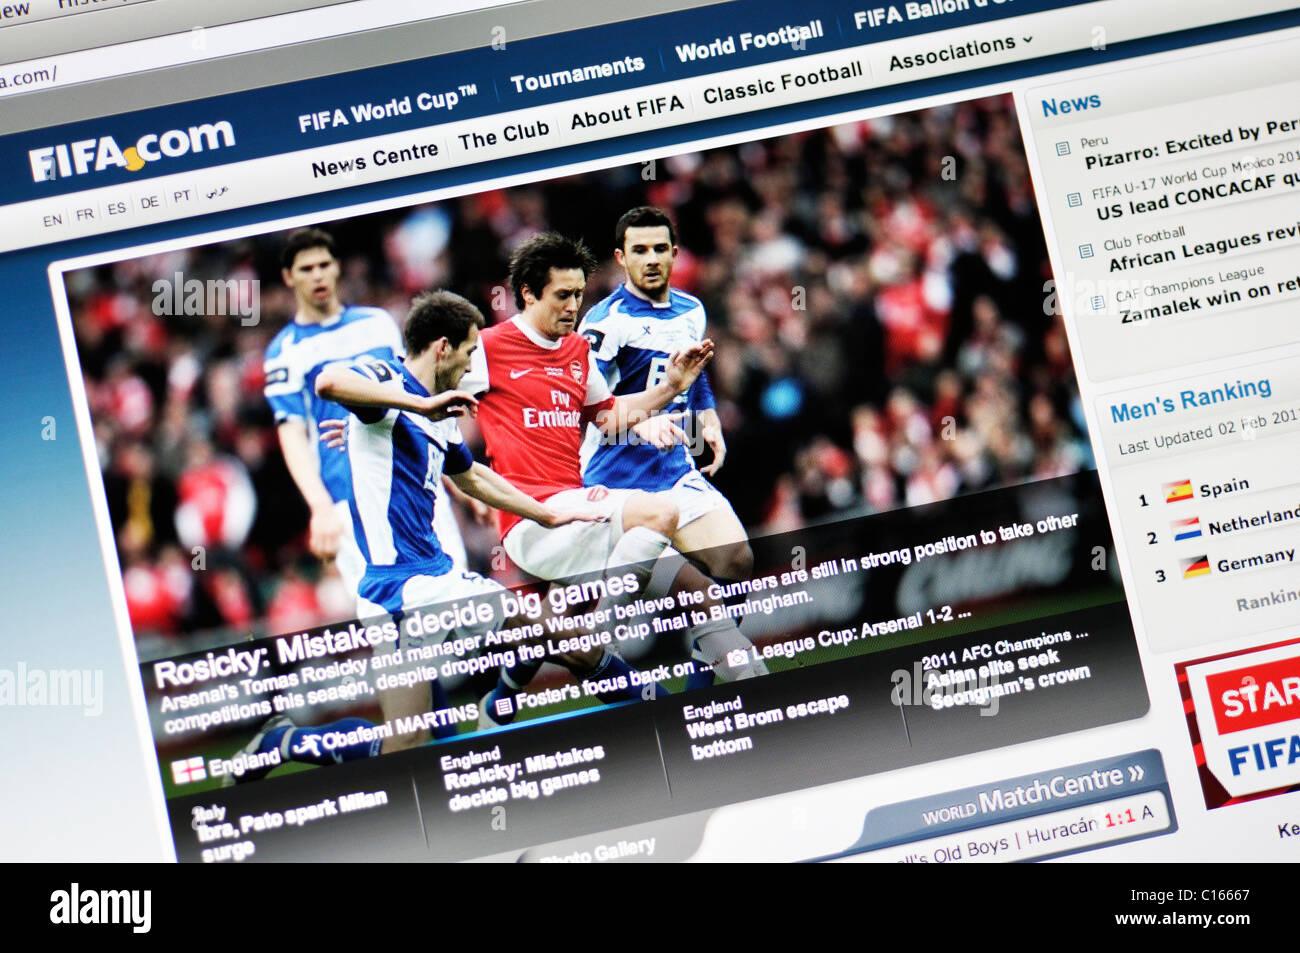 FIFA website - Stock Image